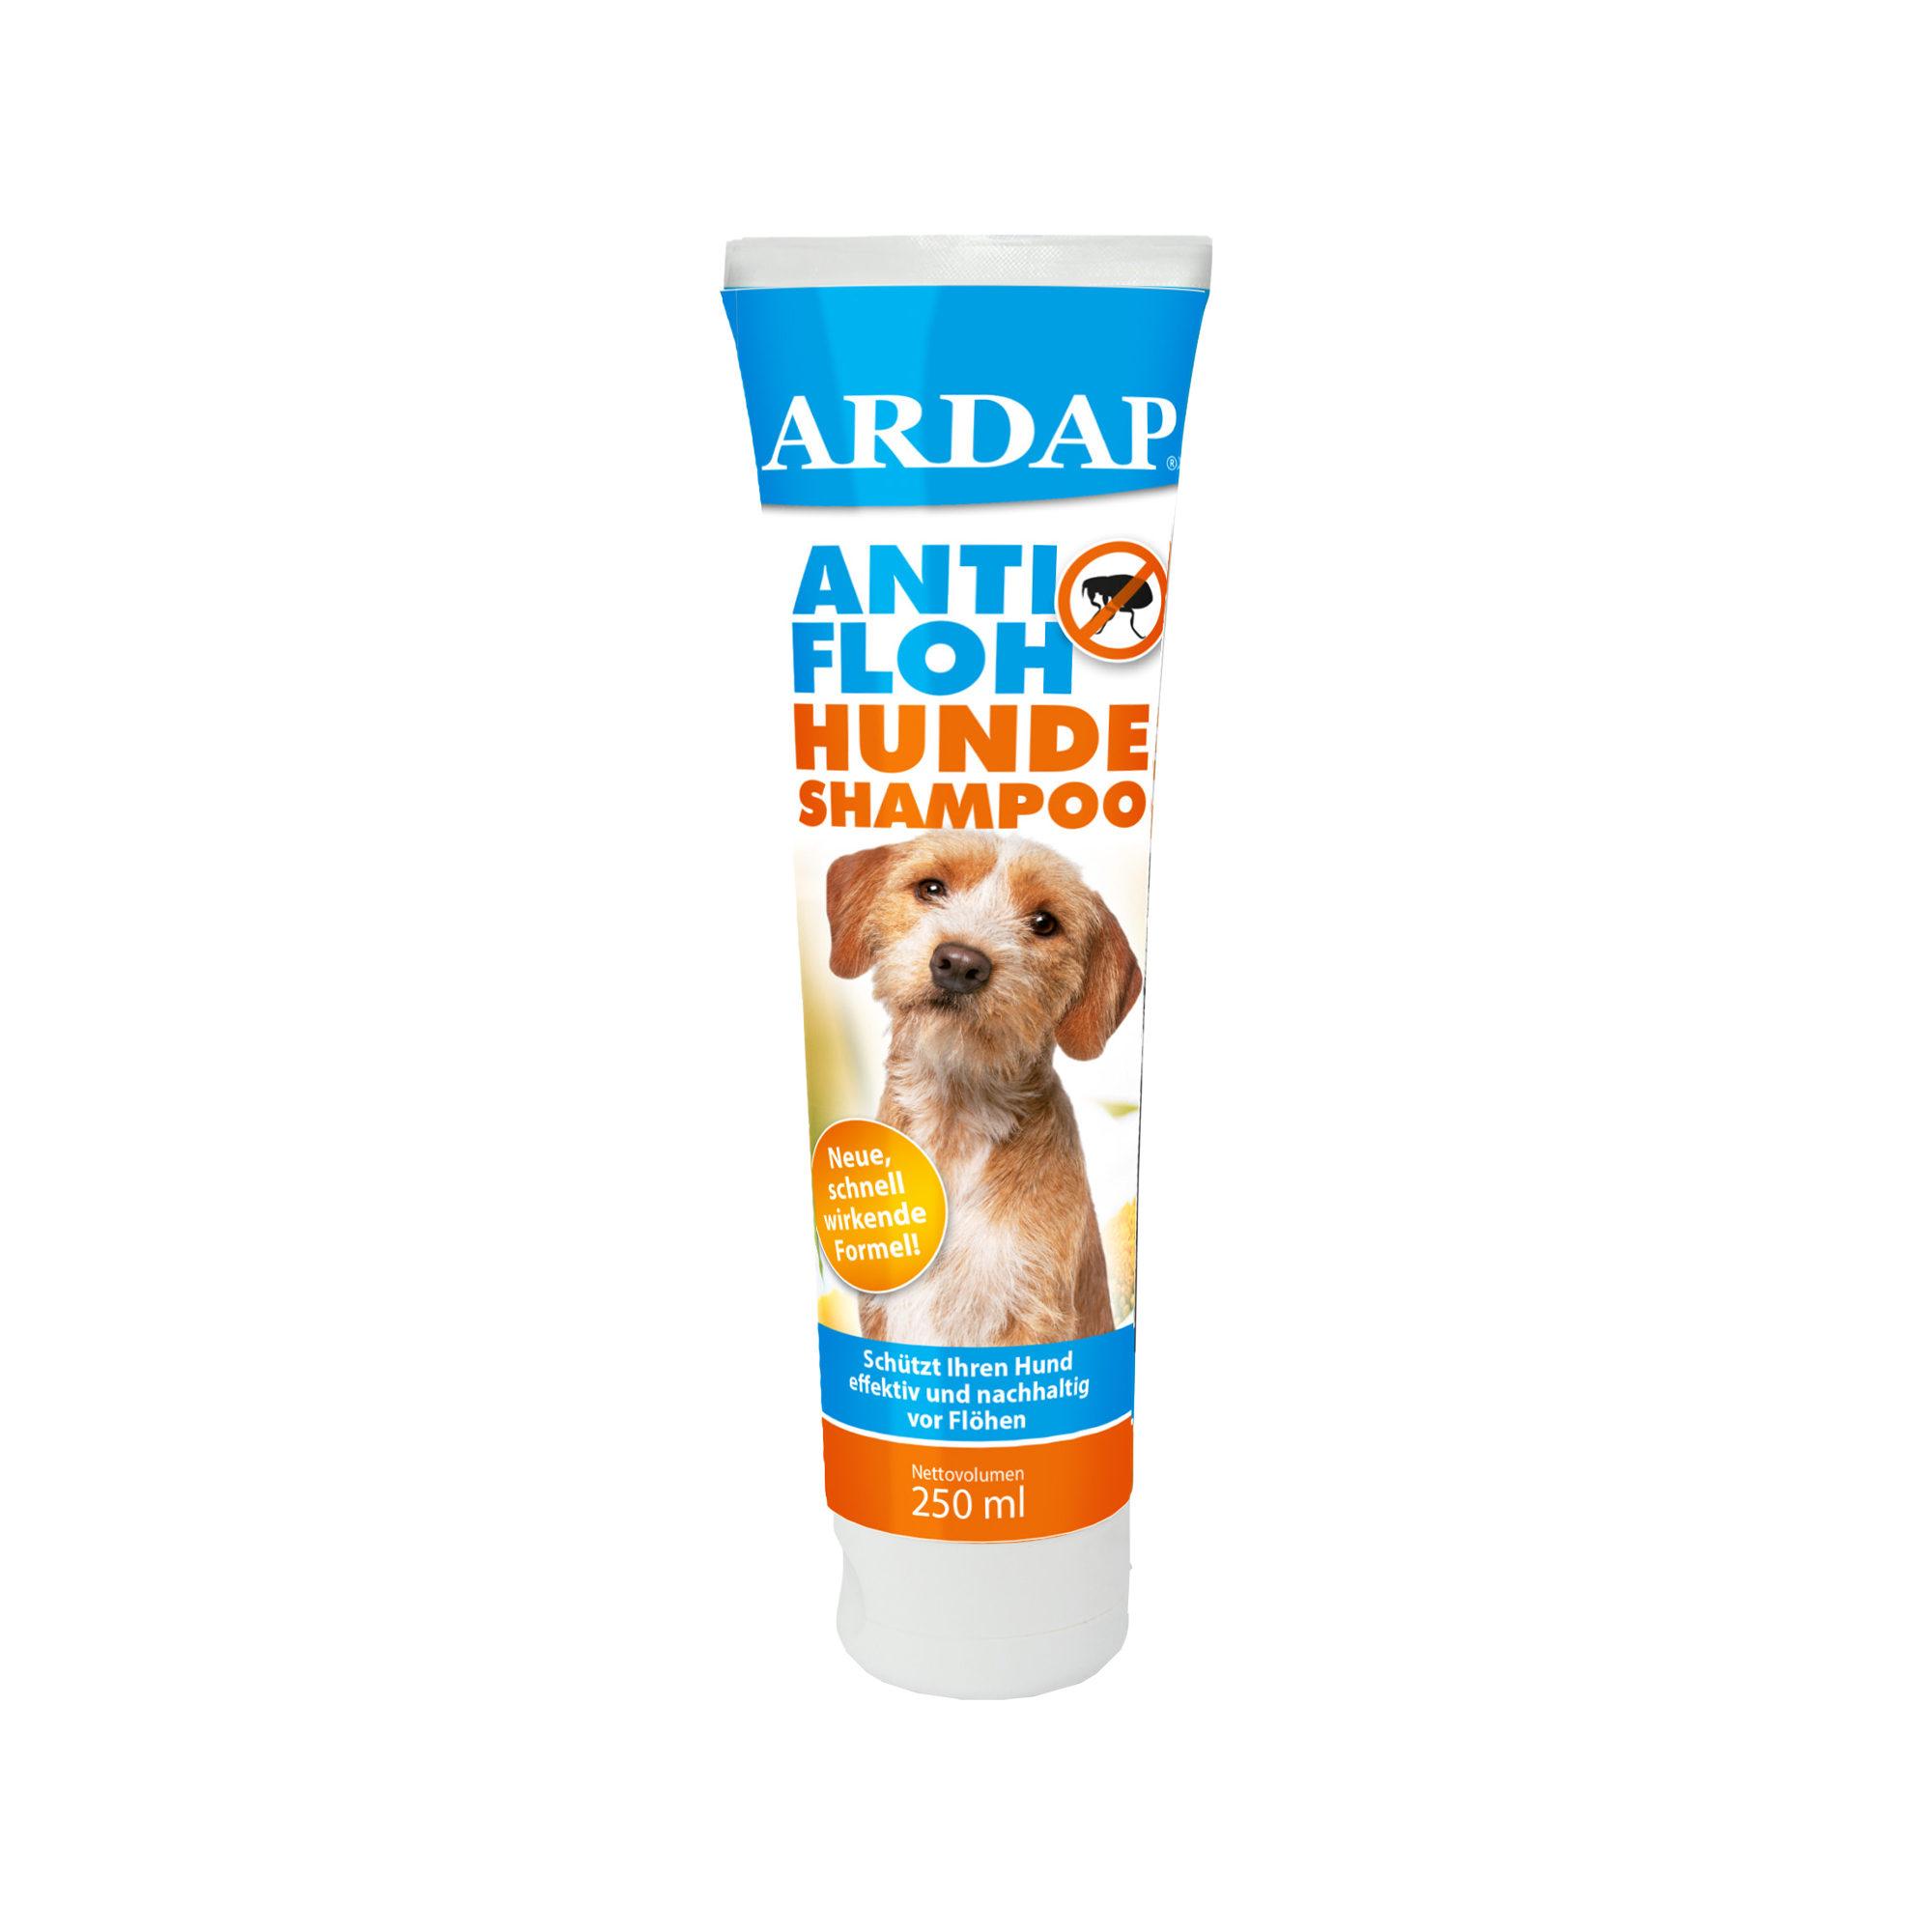 Ardap Anti-Floh Shampoo - 250 ml